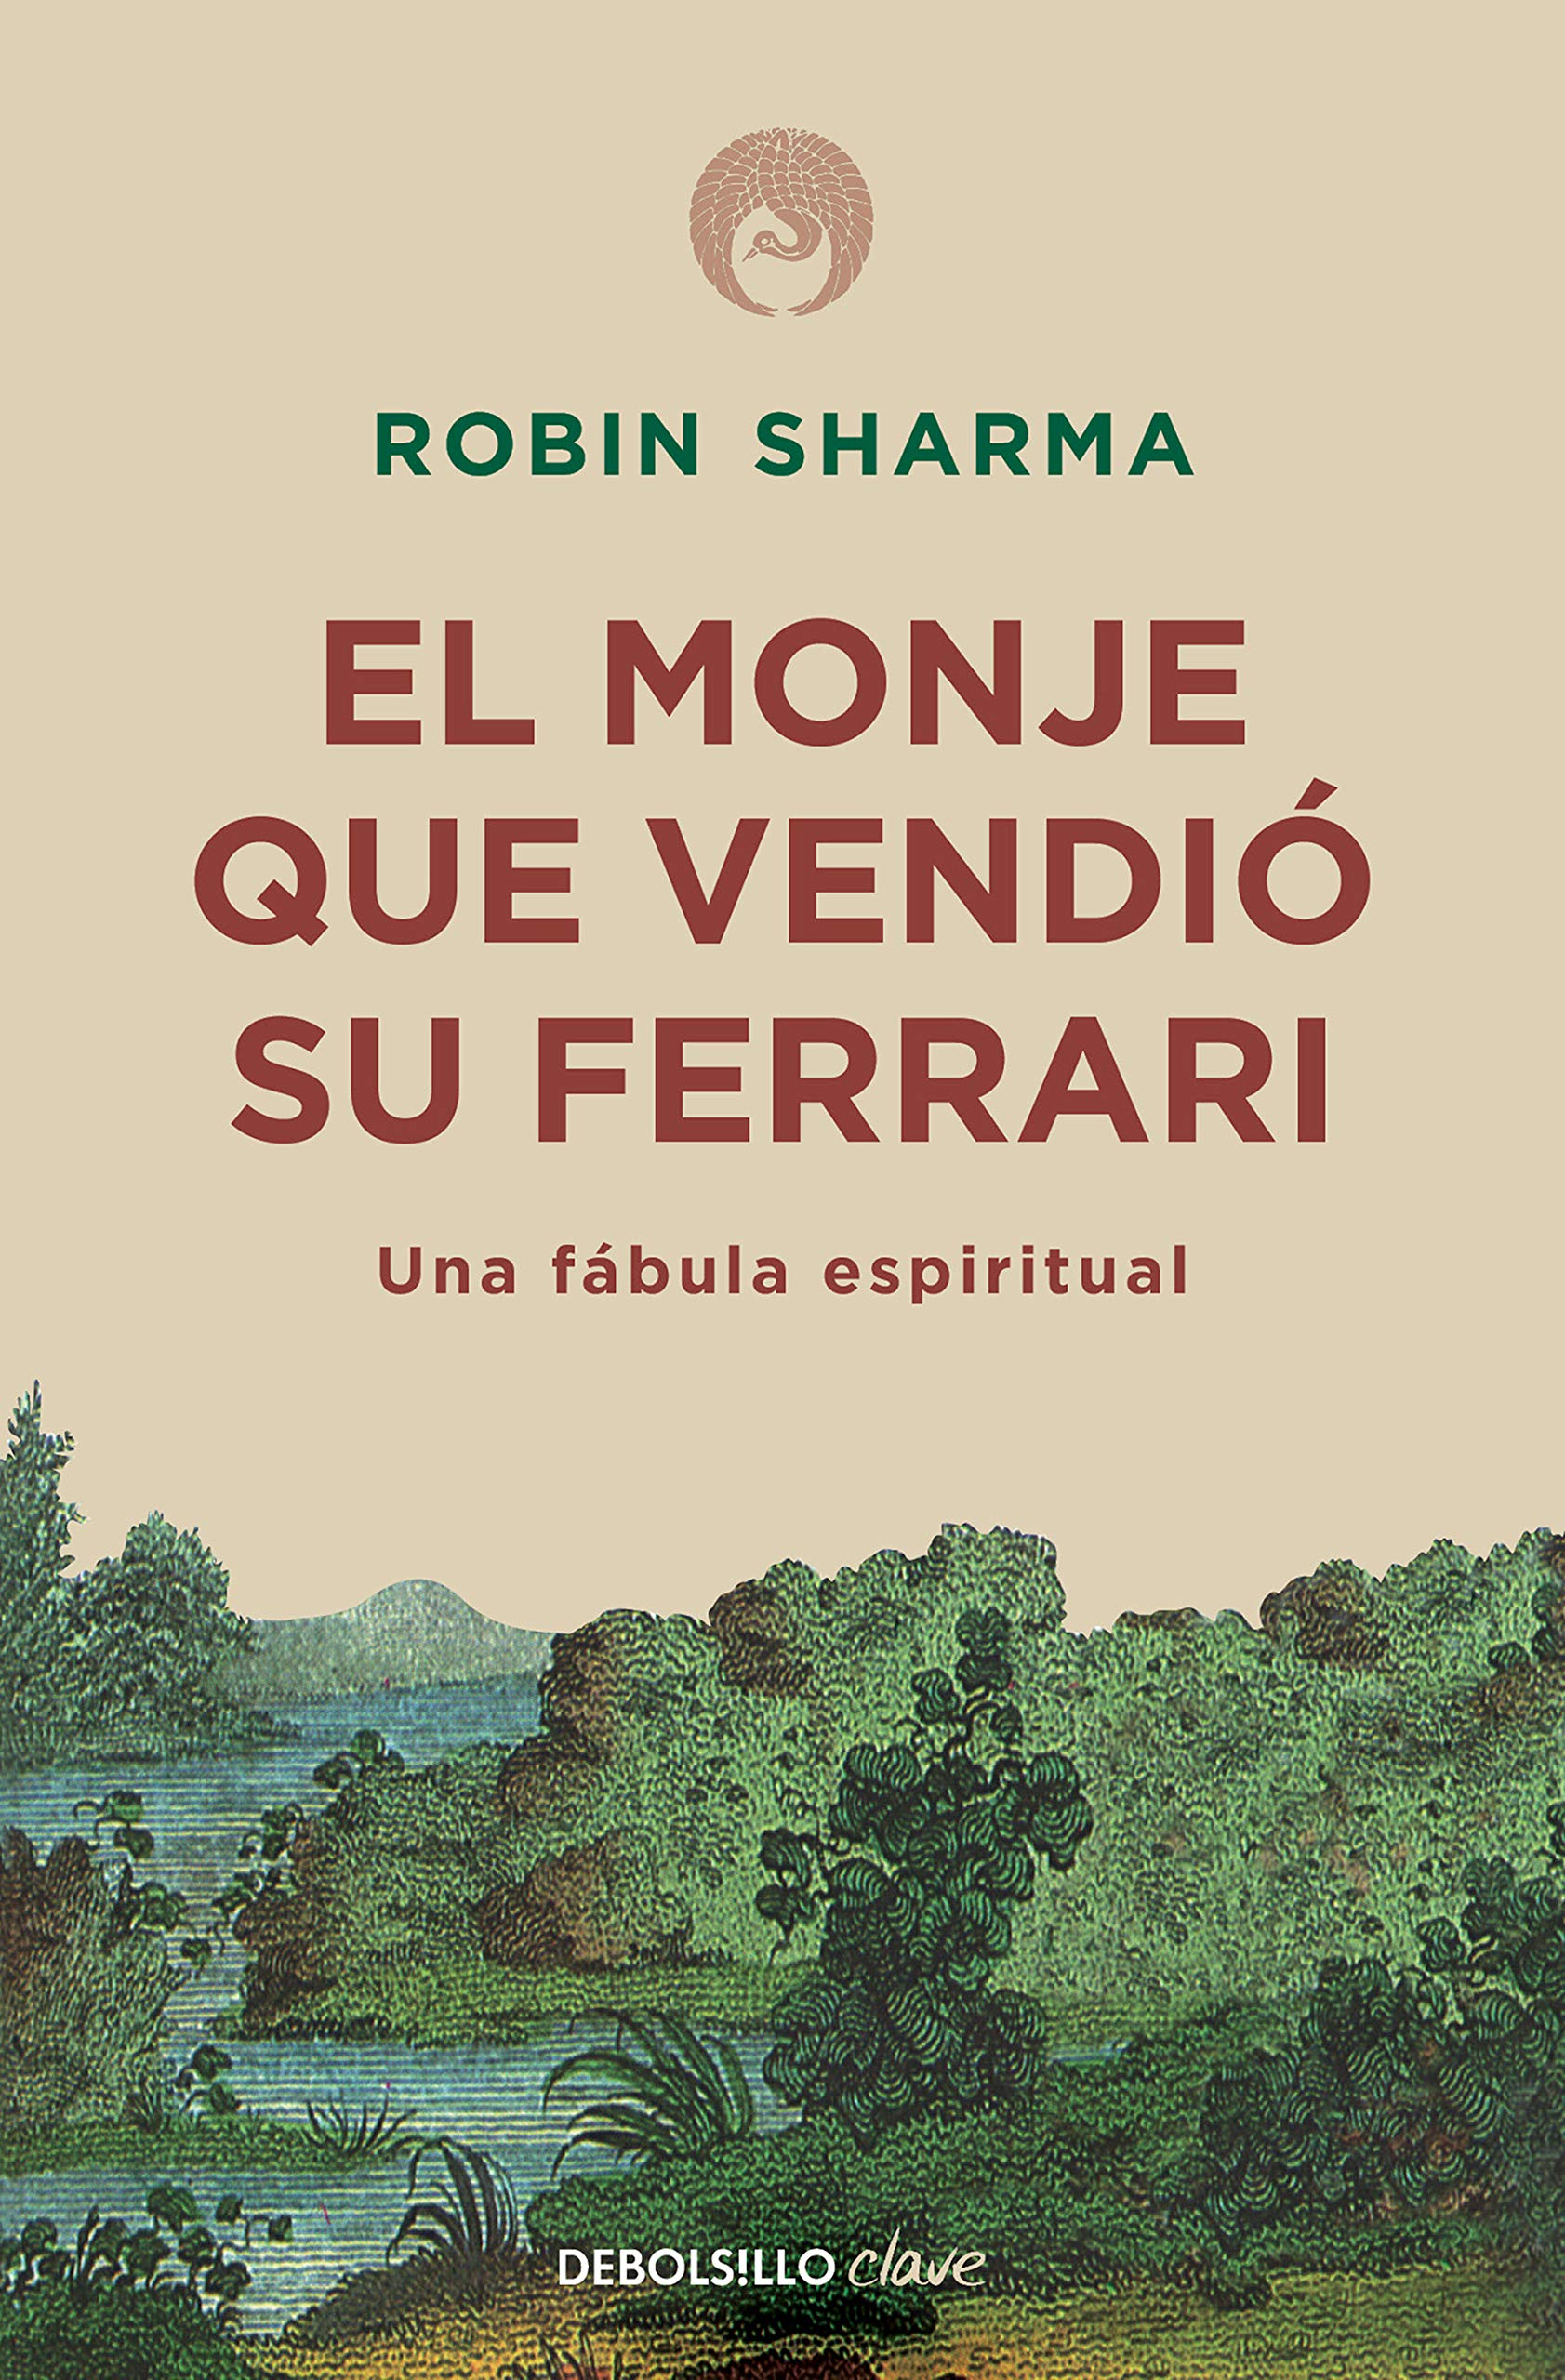 El monje que vendió su Ferrari: Una fábula espiritual / The Monk Who Sold His Ferrari: A Spiritual Fable About…